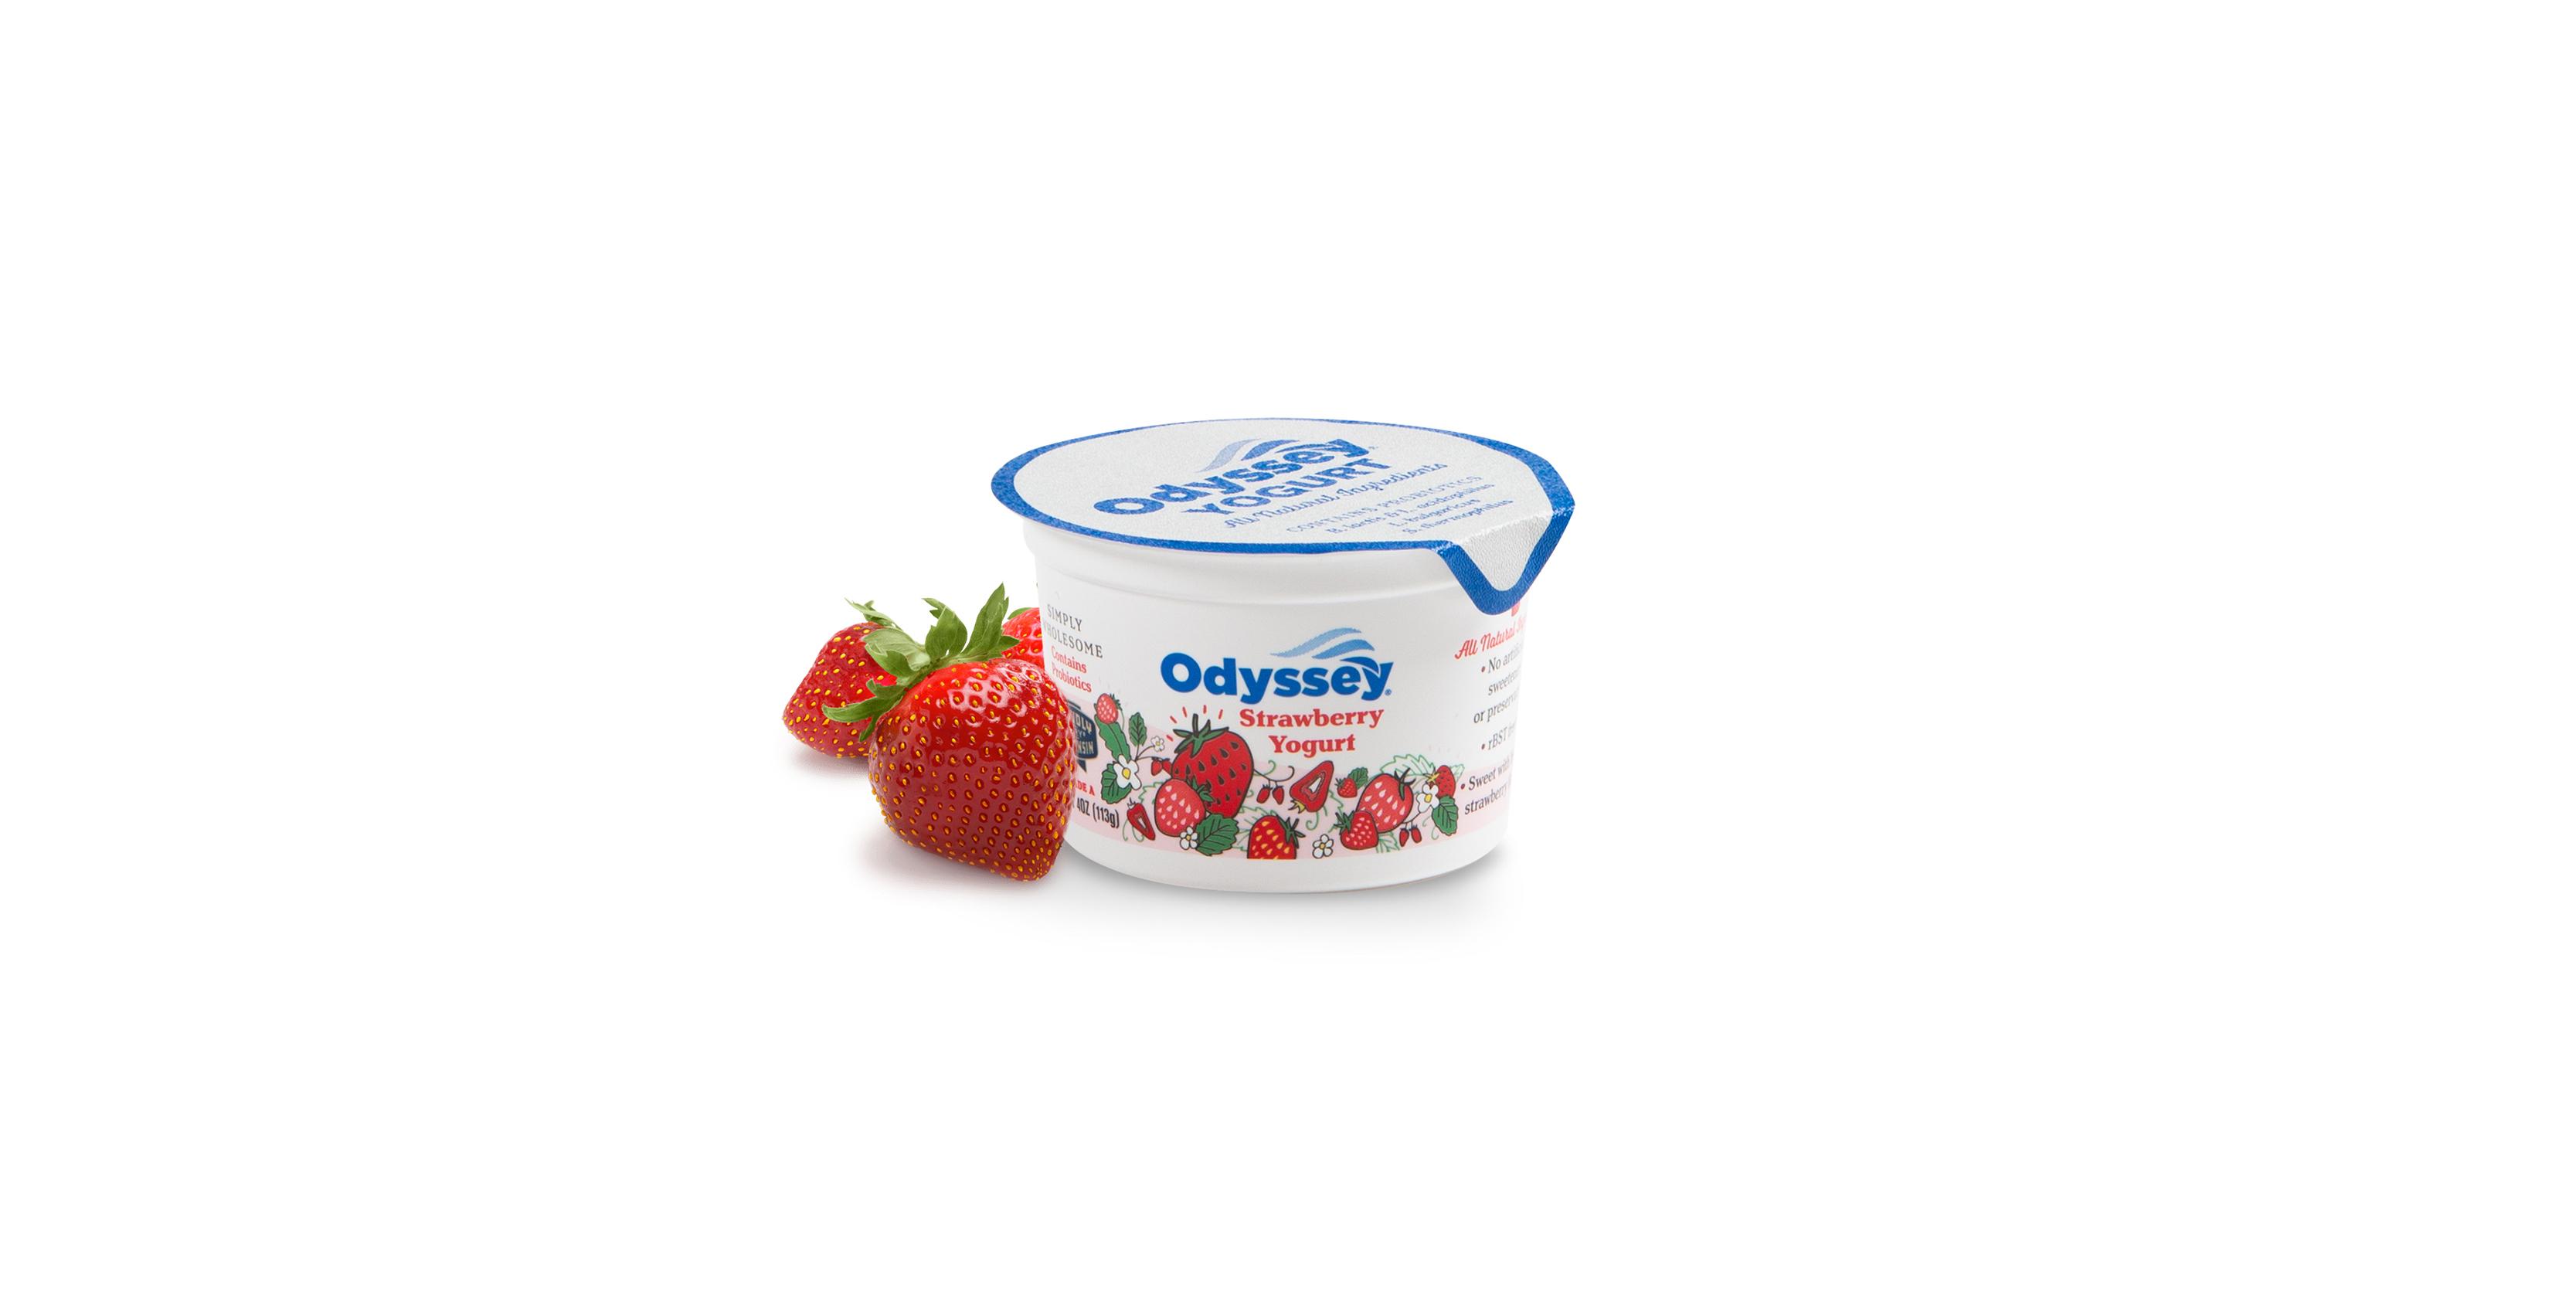 4oz Strawberry with Fruit